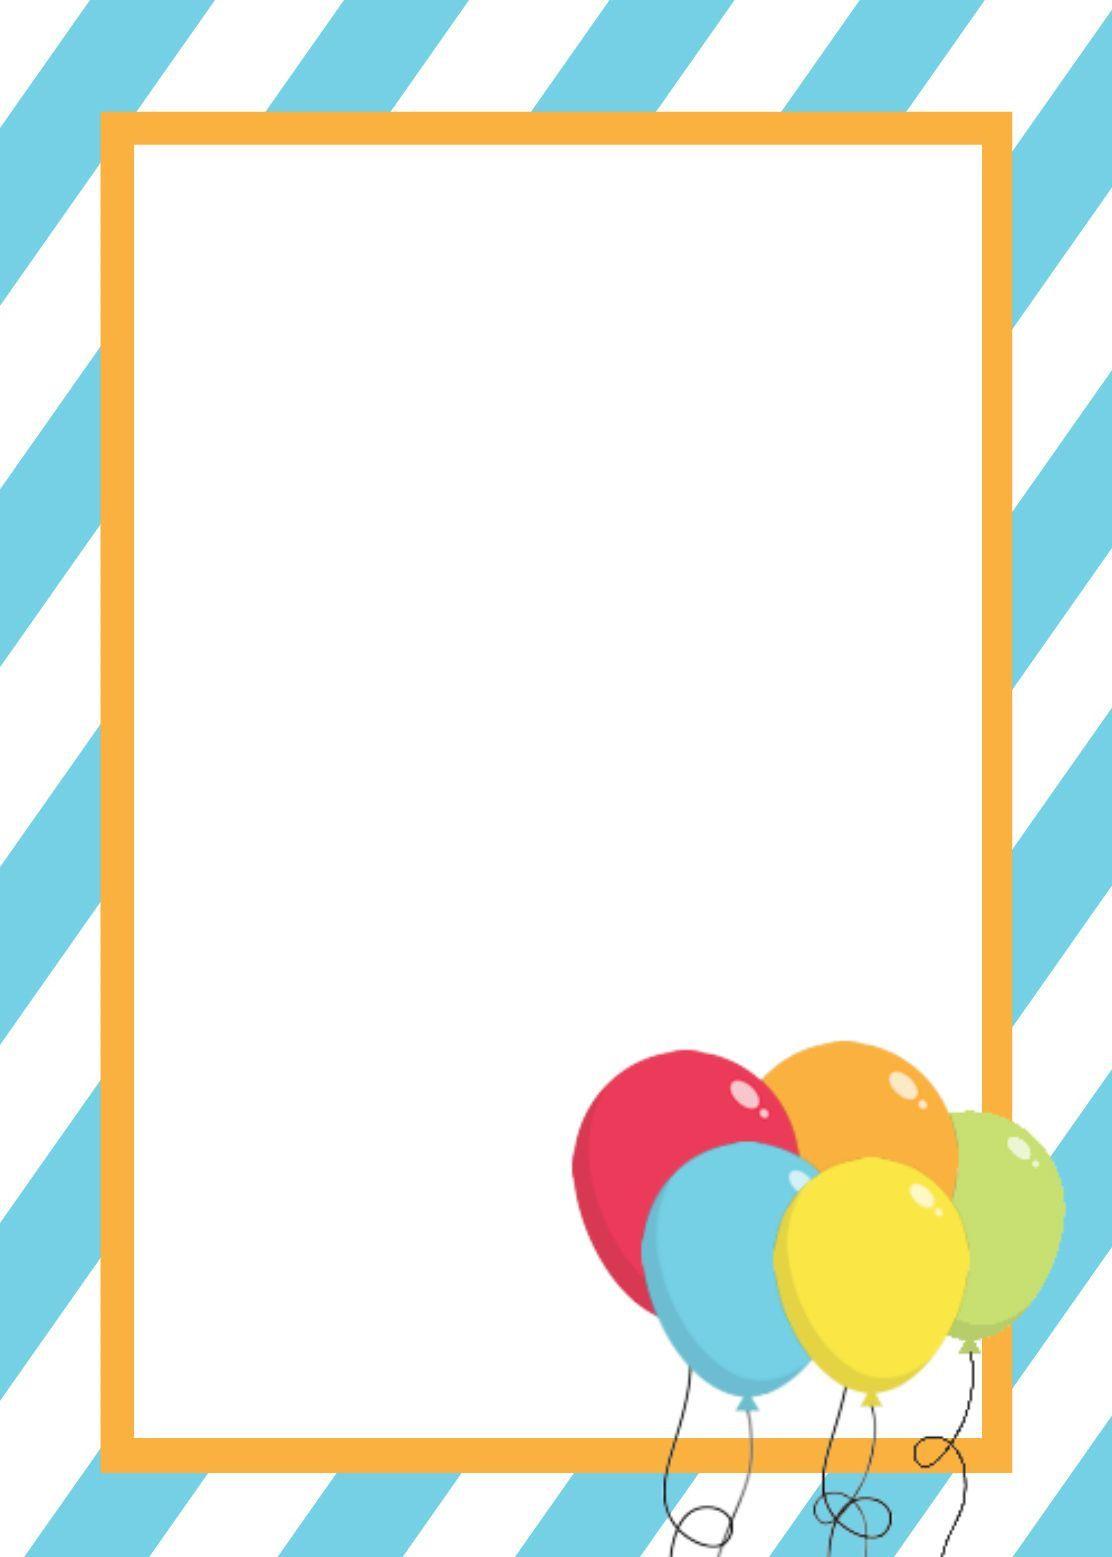 002 Stunning Blank Birthday Card Template For Word Photo  FreeFull